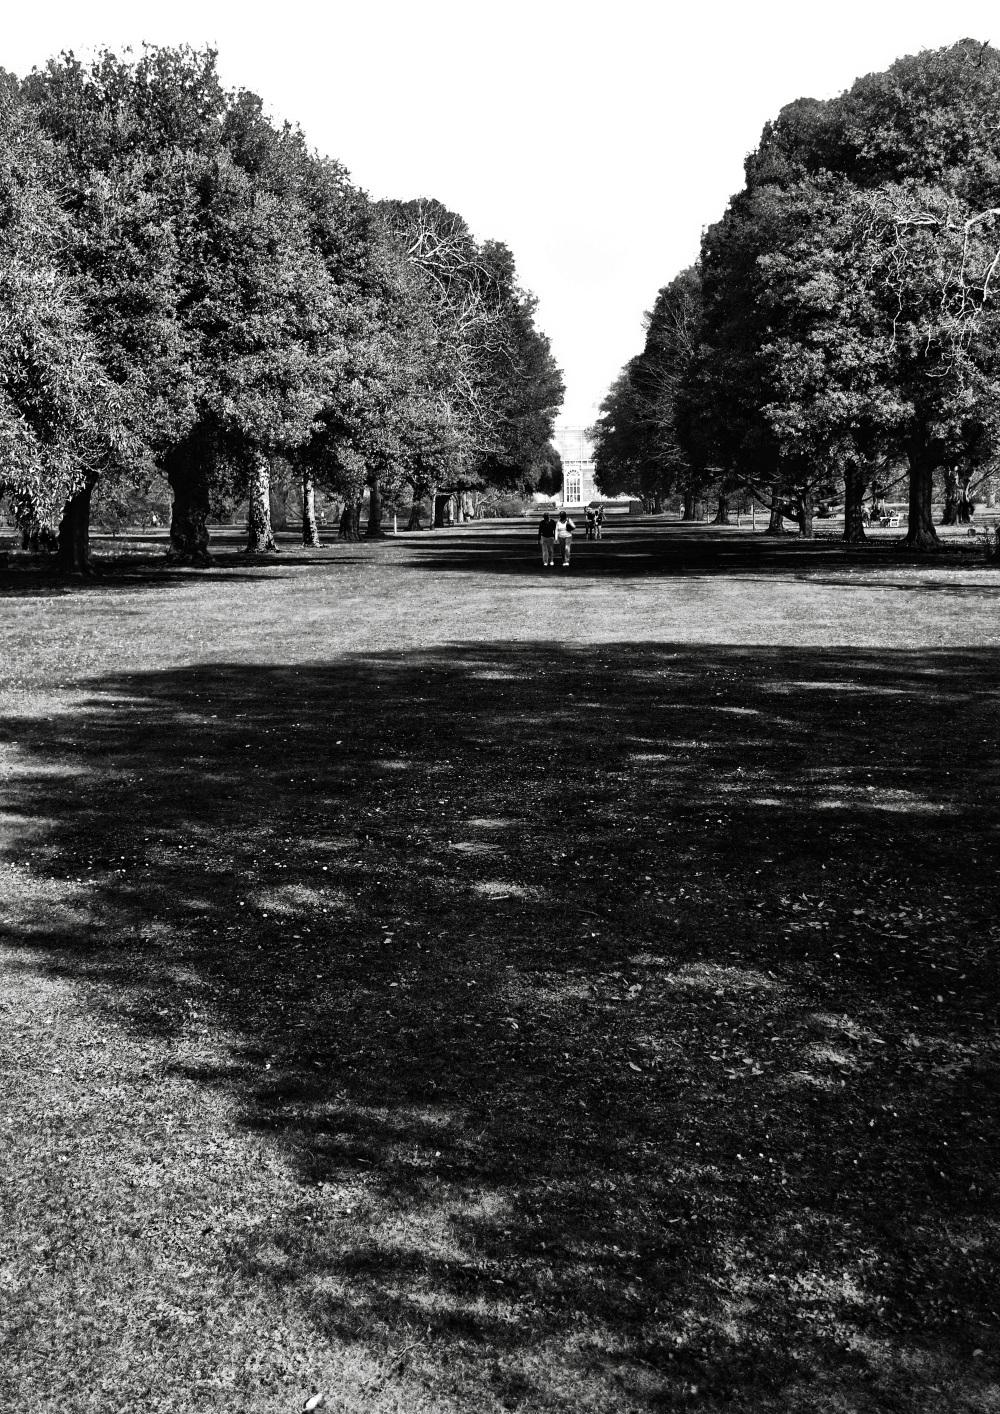 kew-gardens england tree park